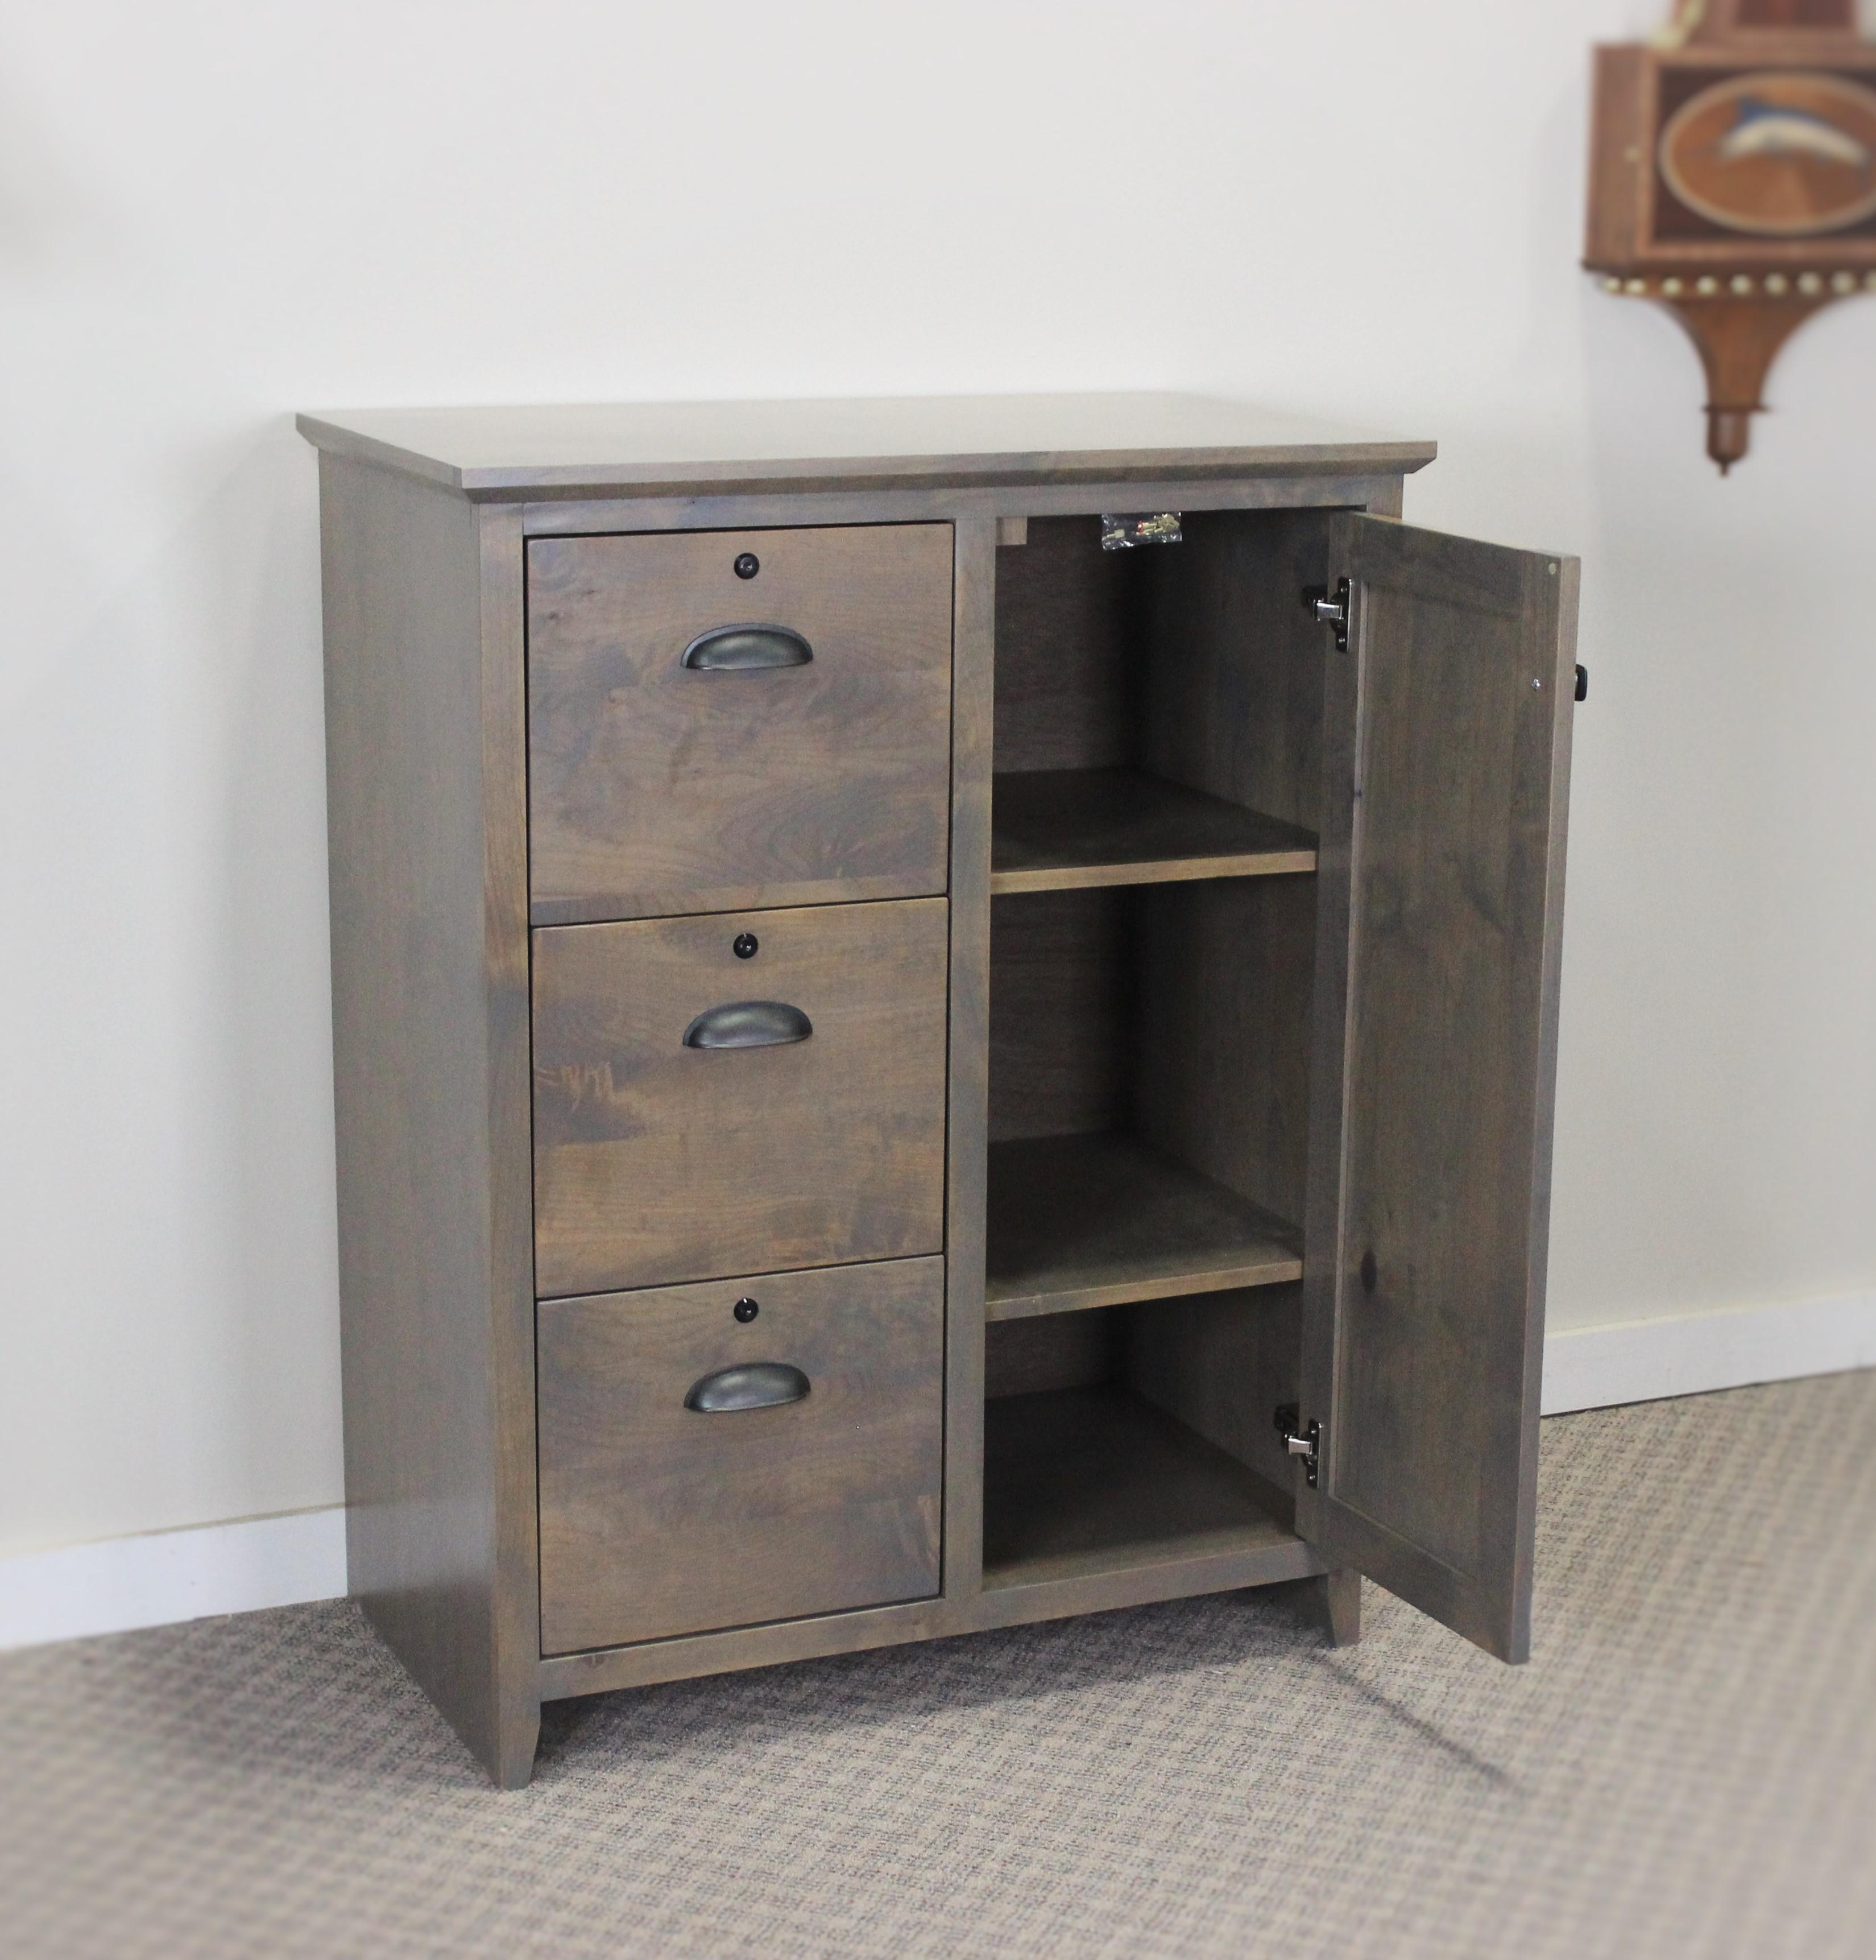 AS4130 Storage